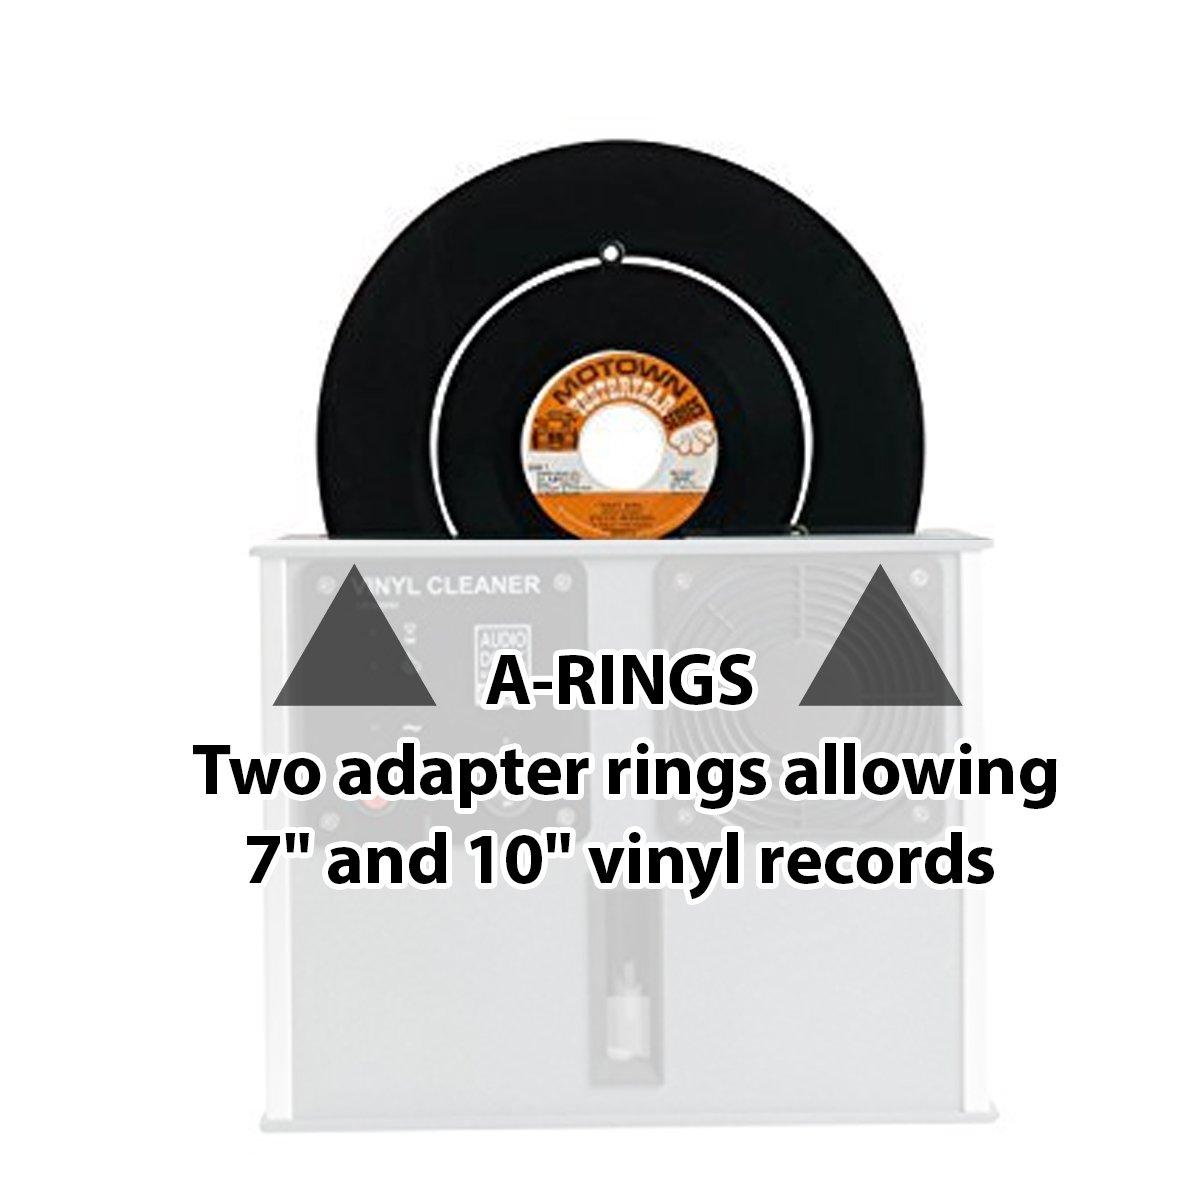 a-ringsのセットfor theオーディオデスクSystemeビニール、レコード、アルバム、LPクリーニングマシン B014HT5WC0